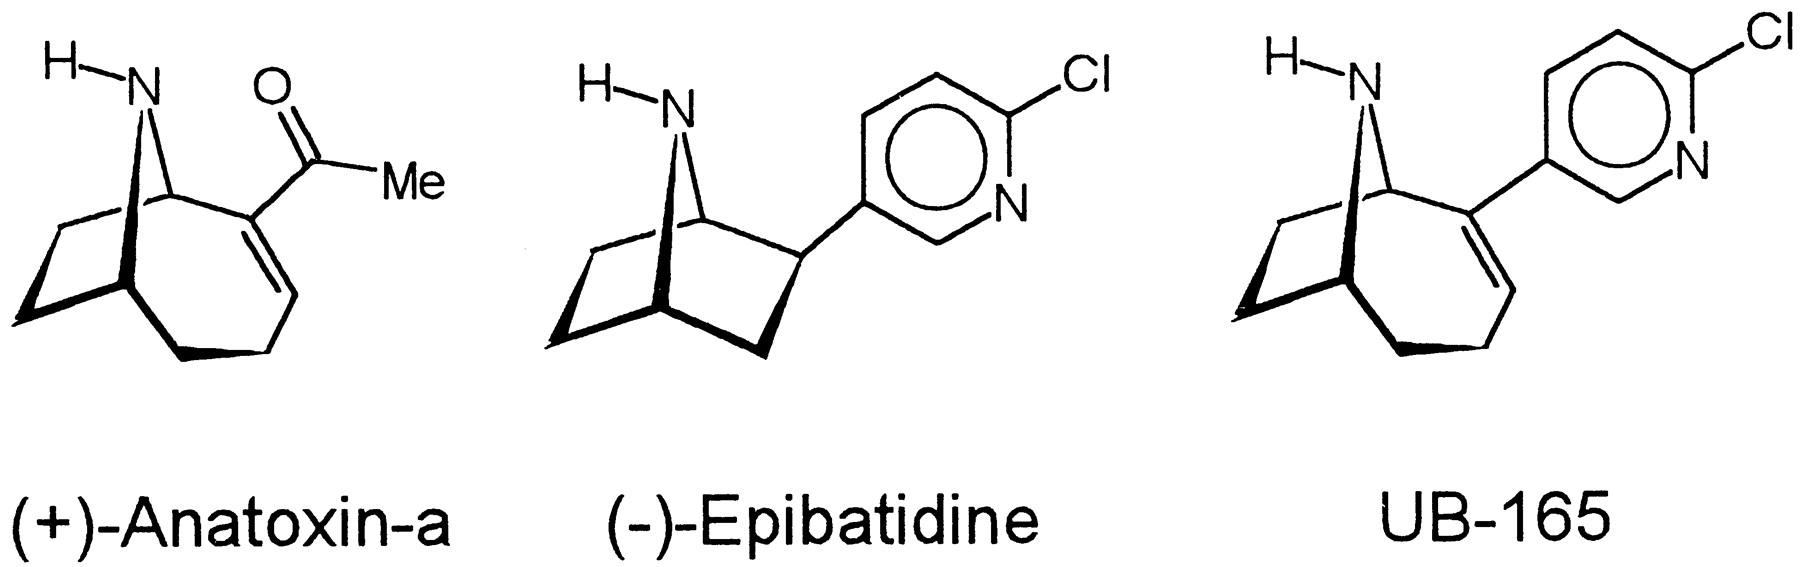 Ub 165 A Novel Nicotinic Agonist With Subtype Selectivity